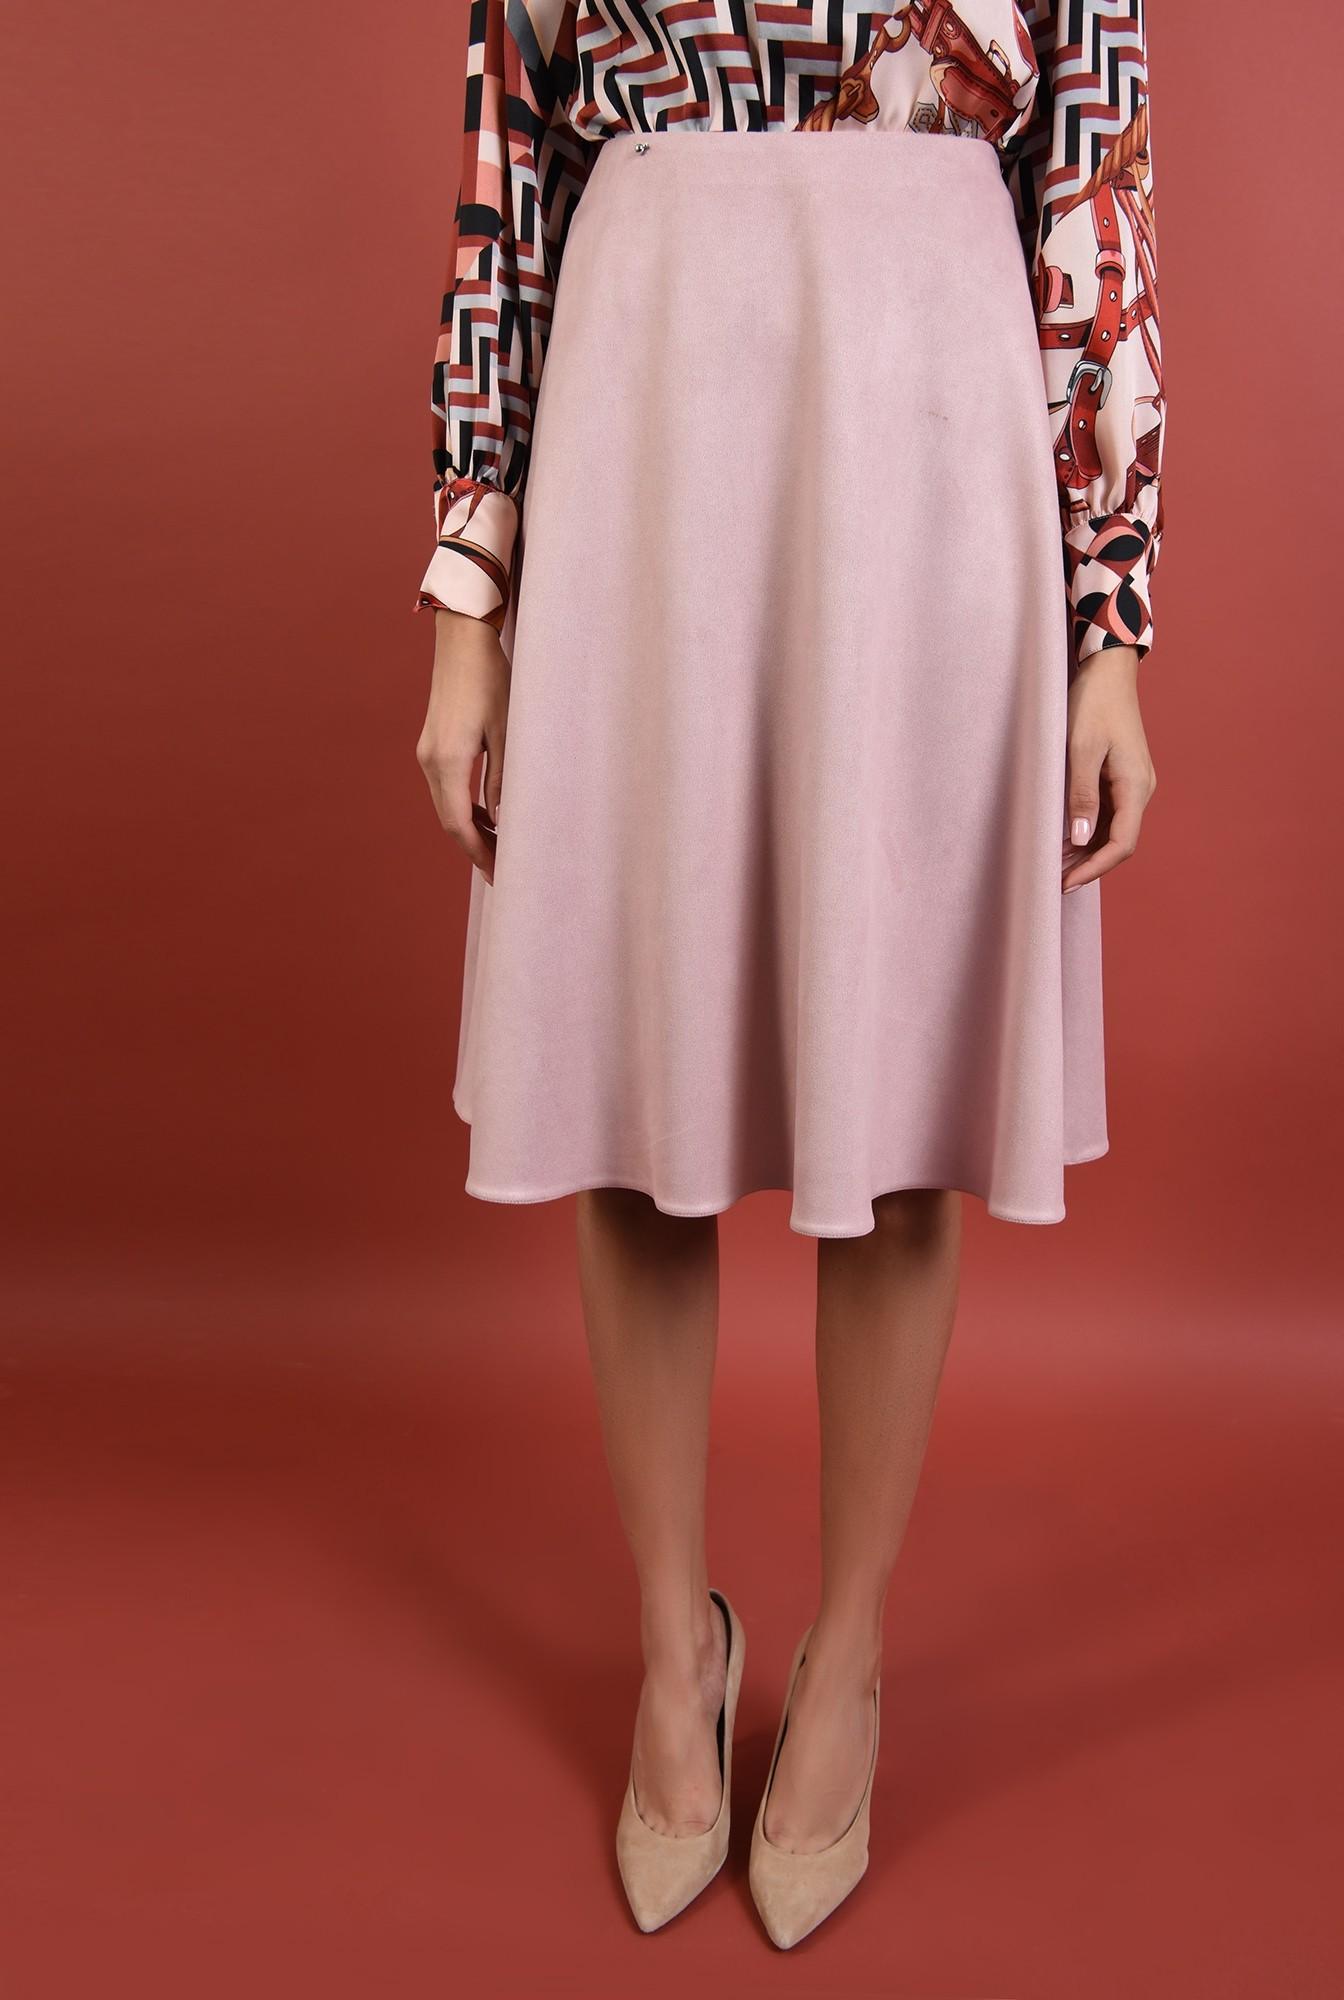 2 - 360 - fusta evazata, roz pudrat, talie inalta, cu betelie, casual